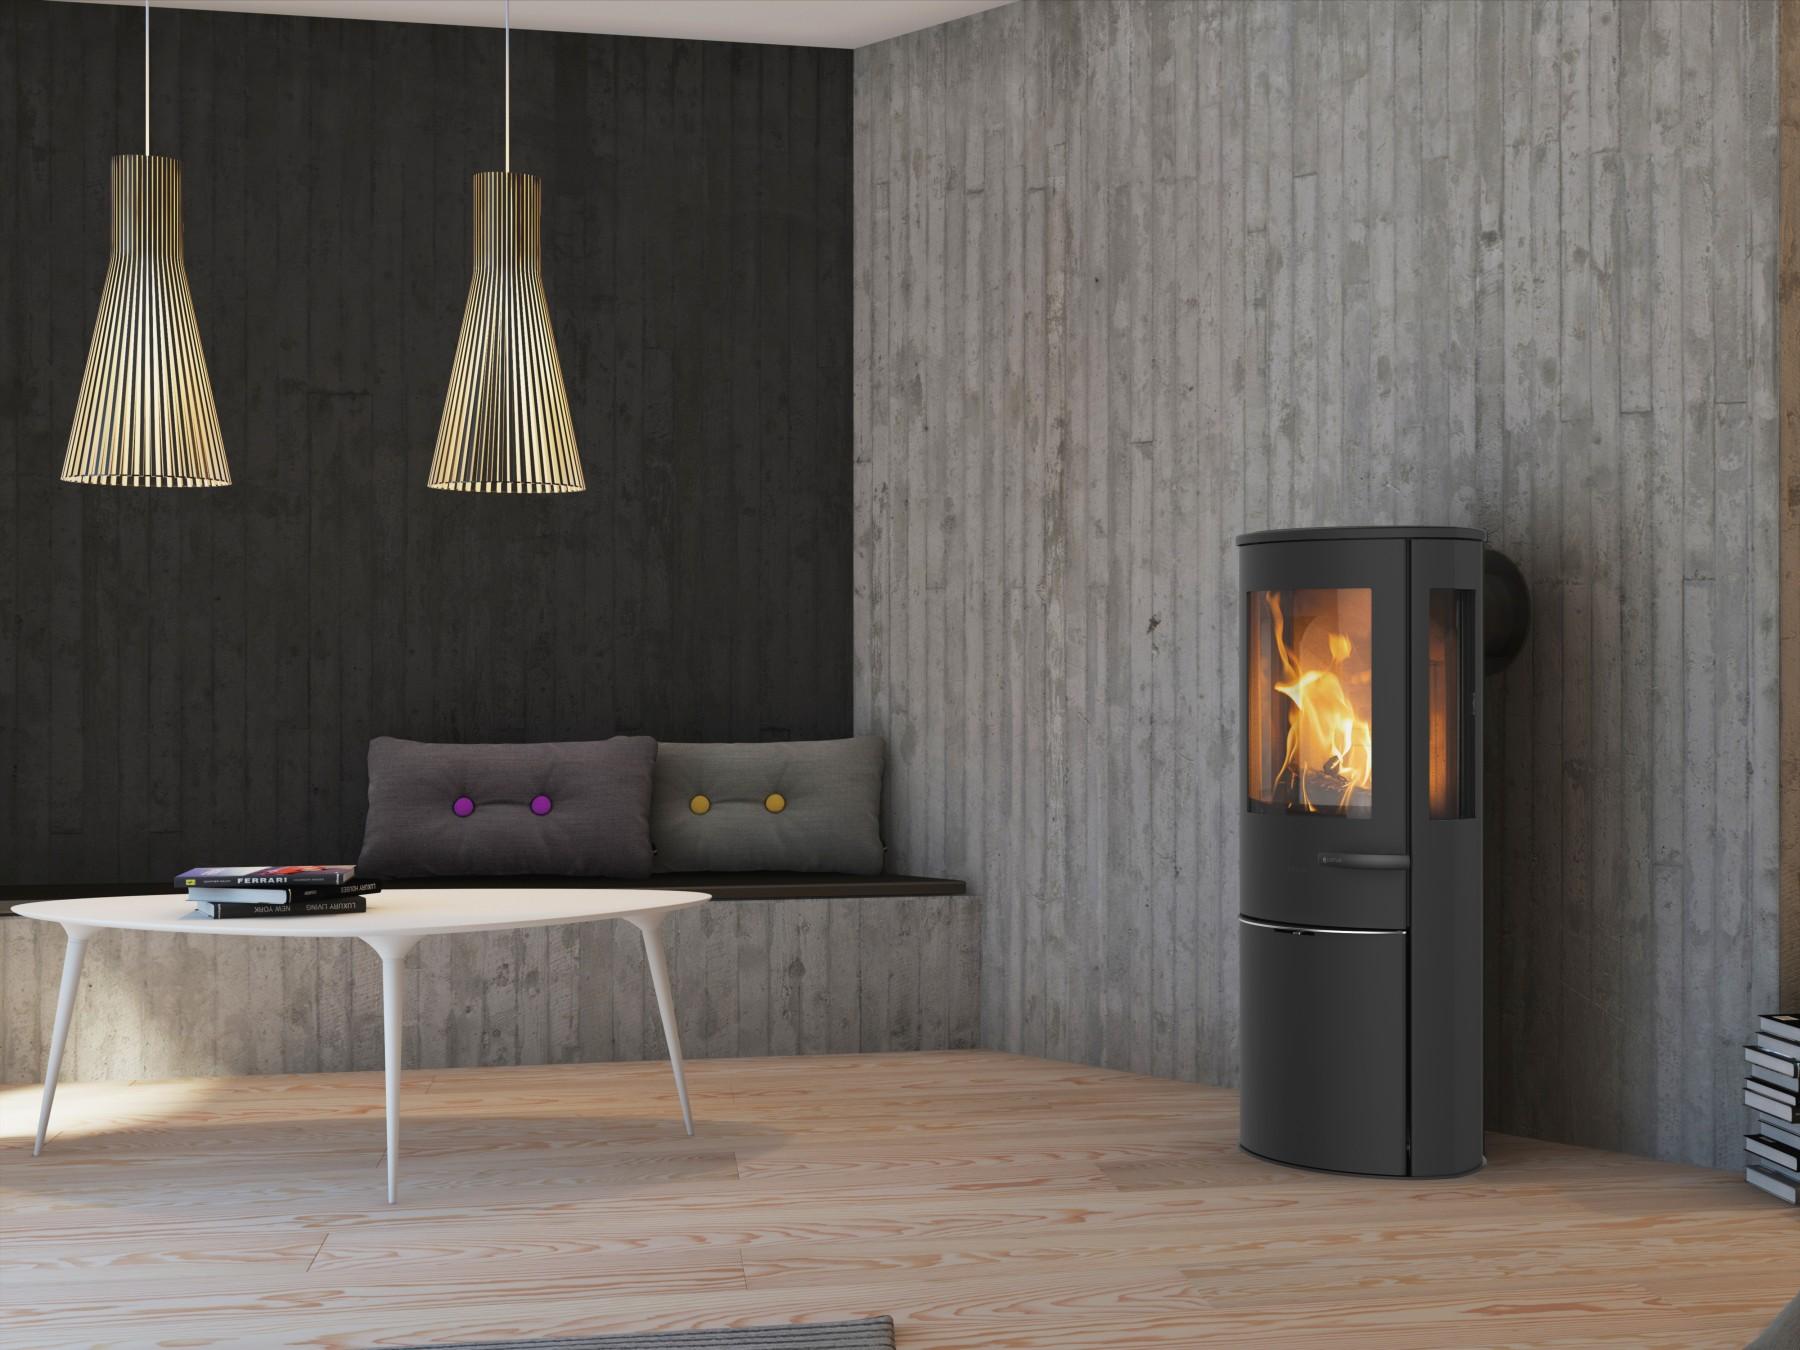 lotus liva 6 g kaminofen feuerland kiel. Black Bedroom Furniture Sets. Home Design Ideas